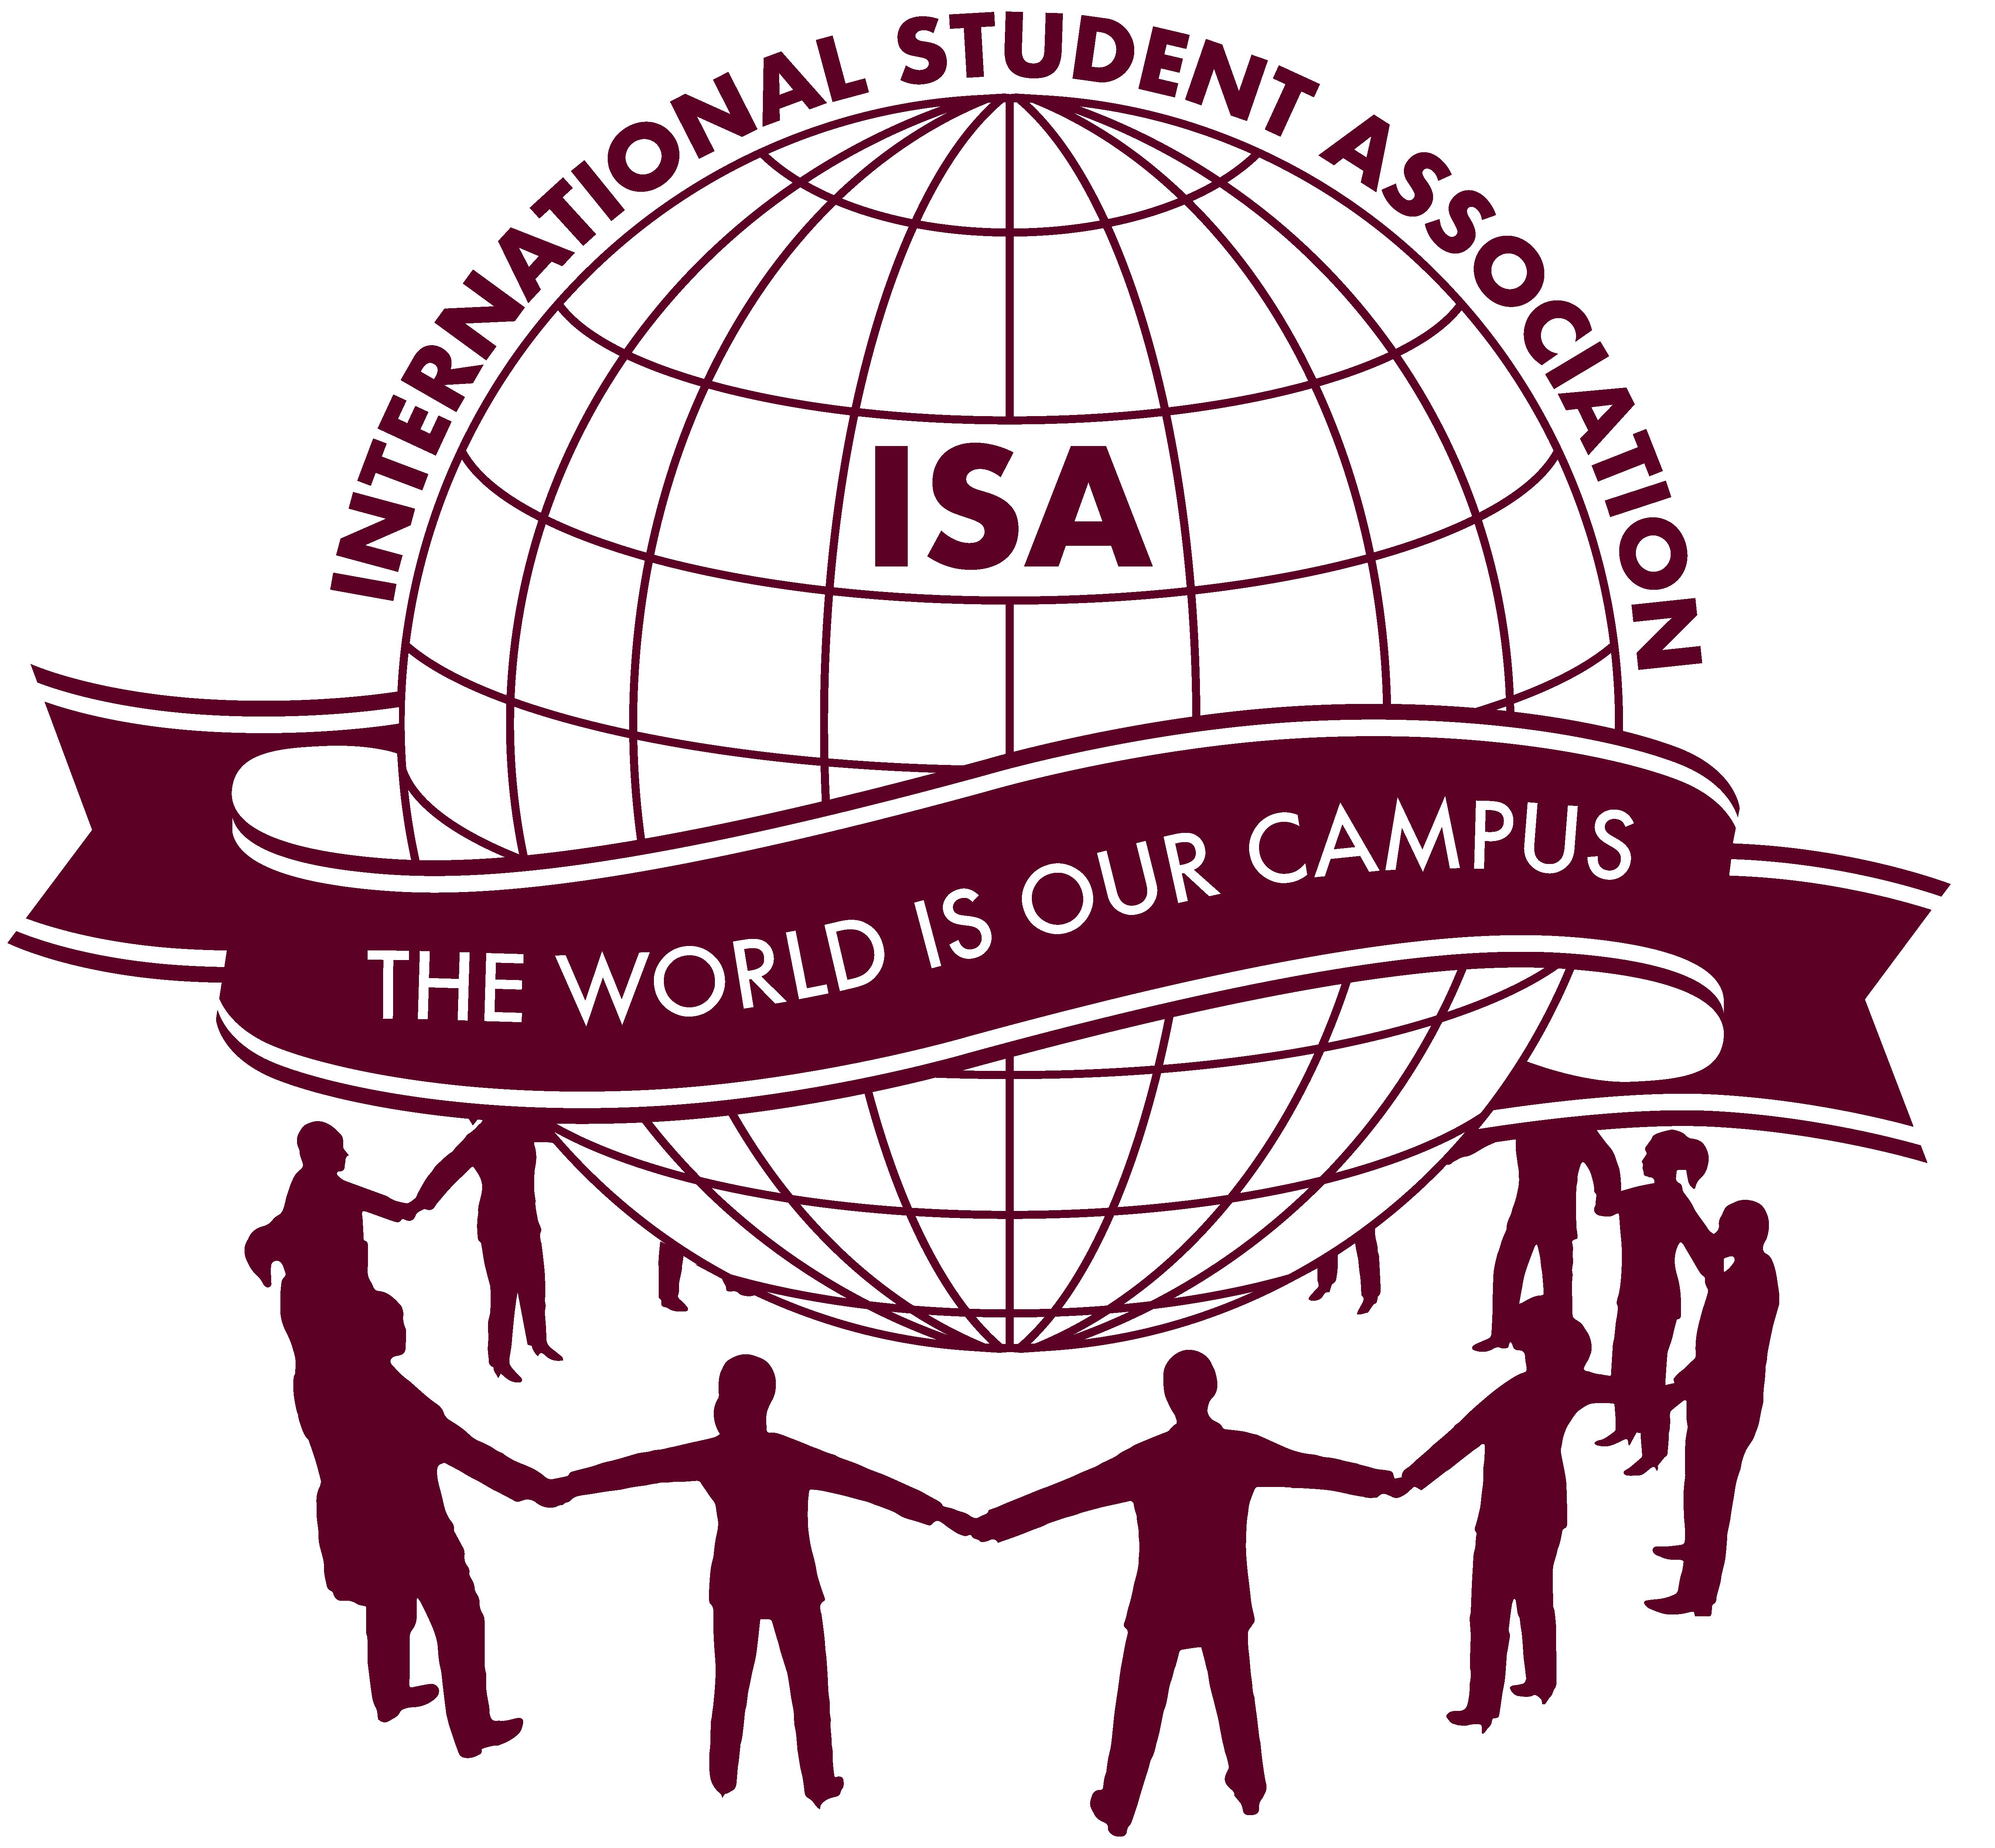 isa membership semester Professional Resume Samples Attorney